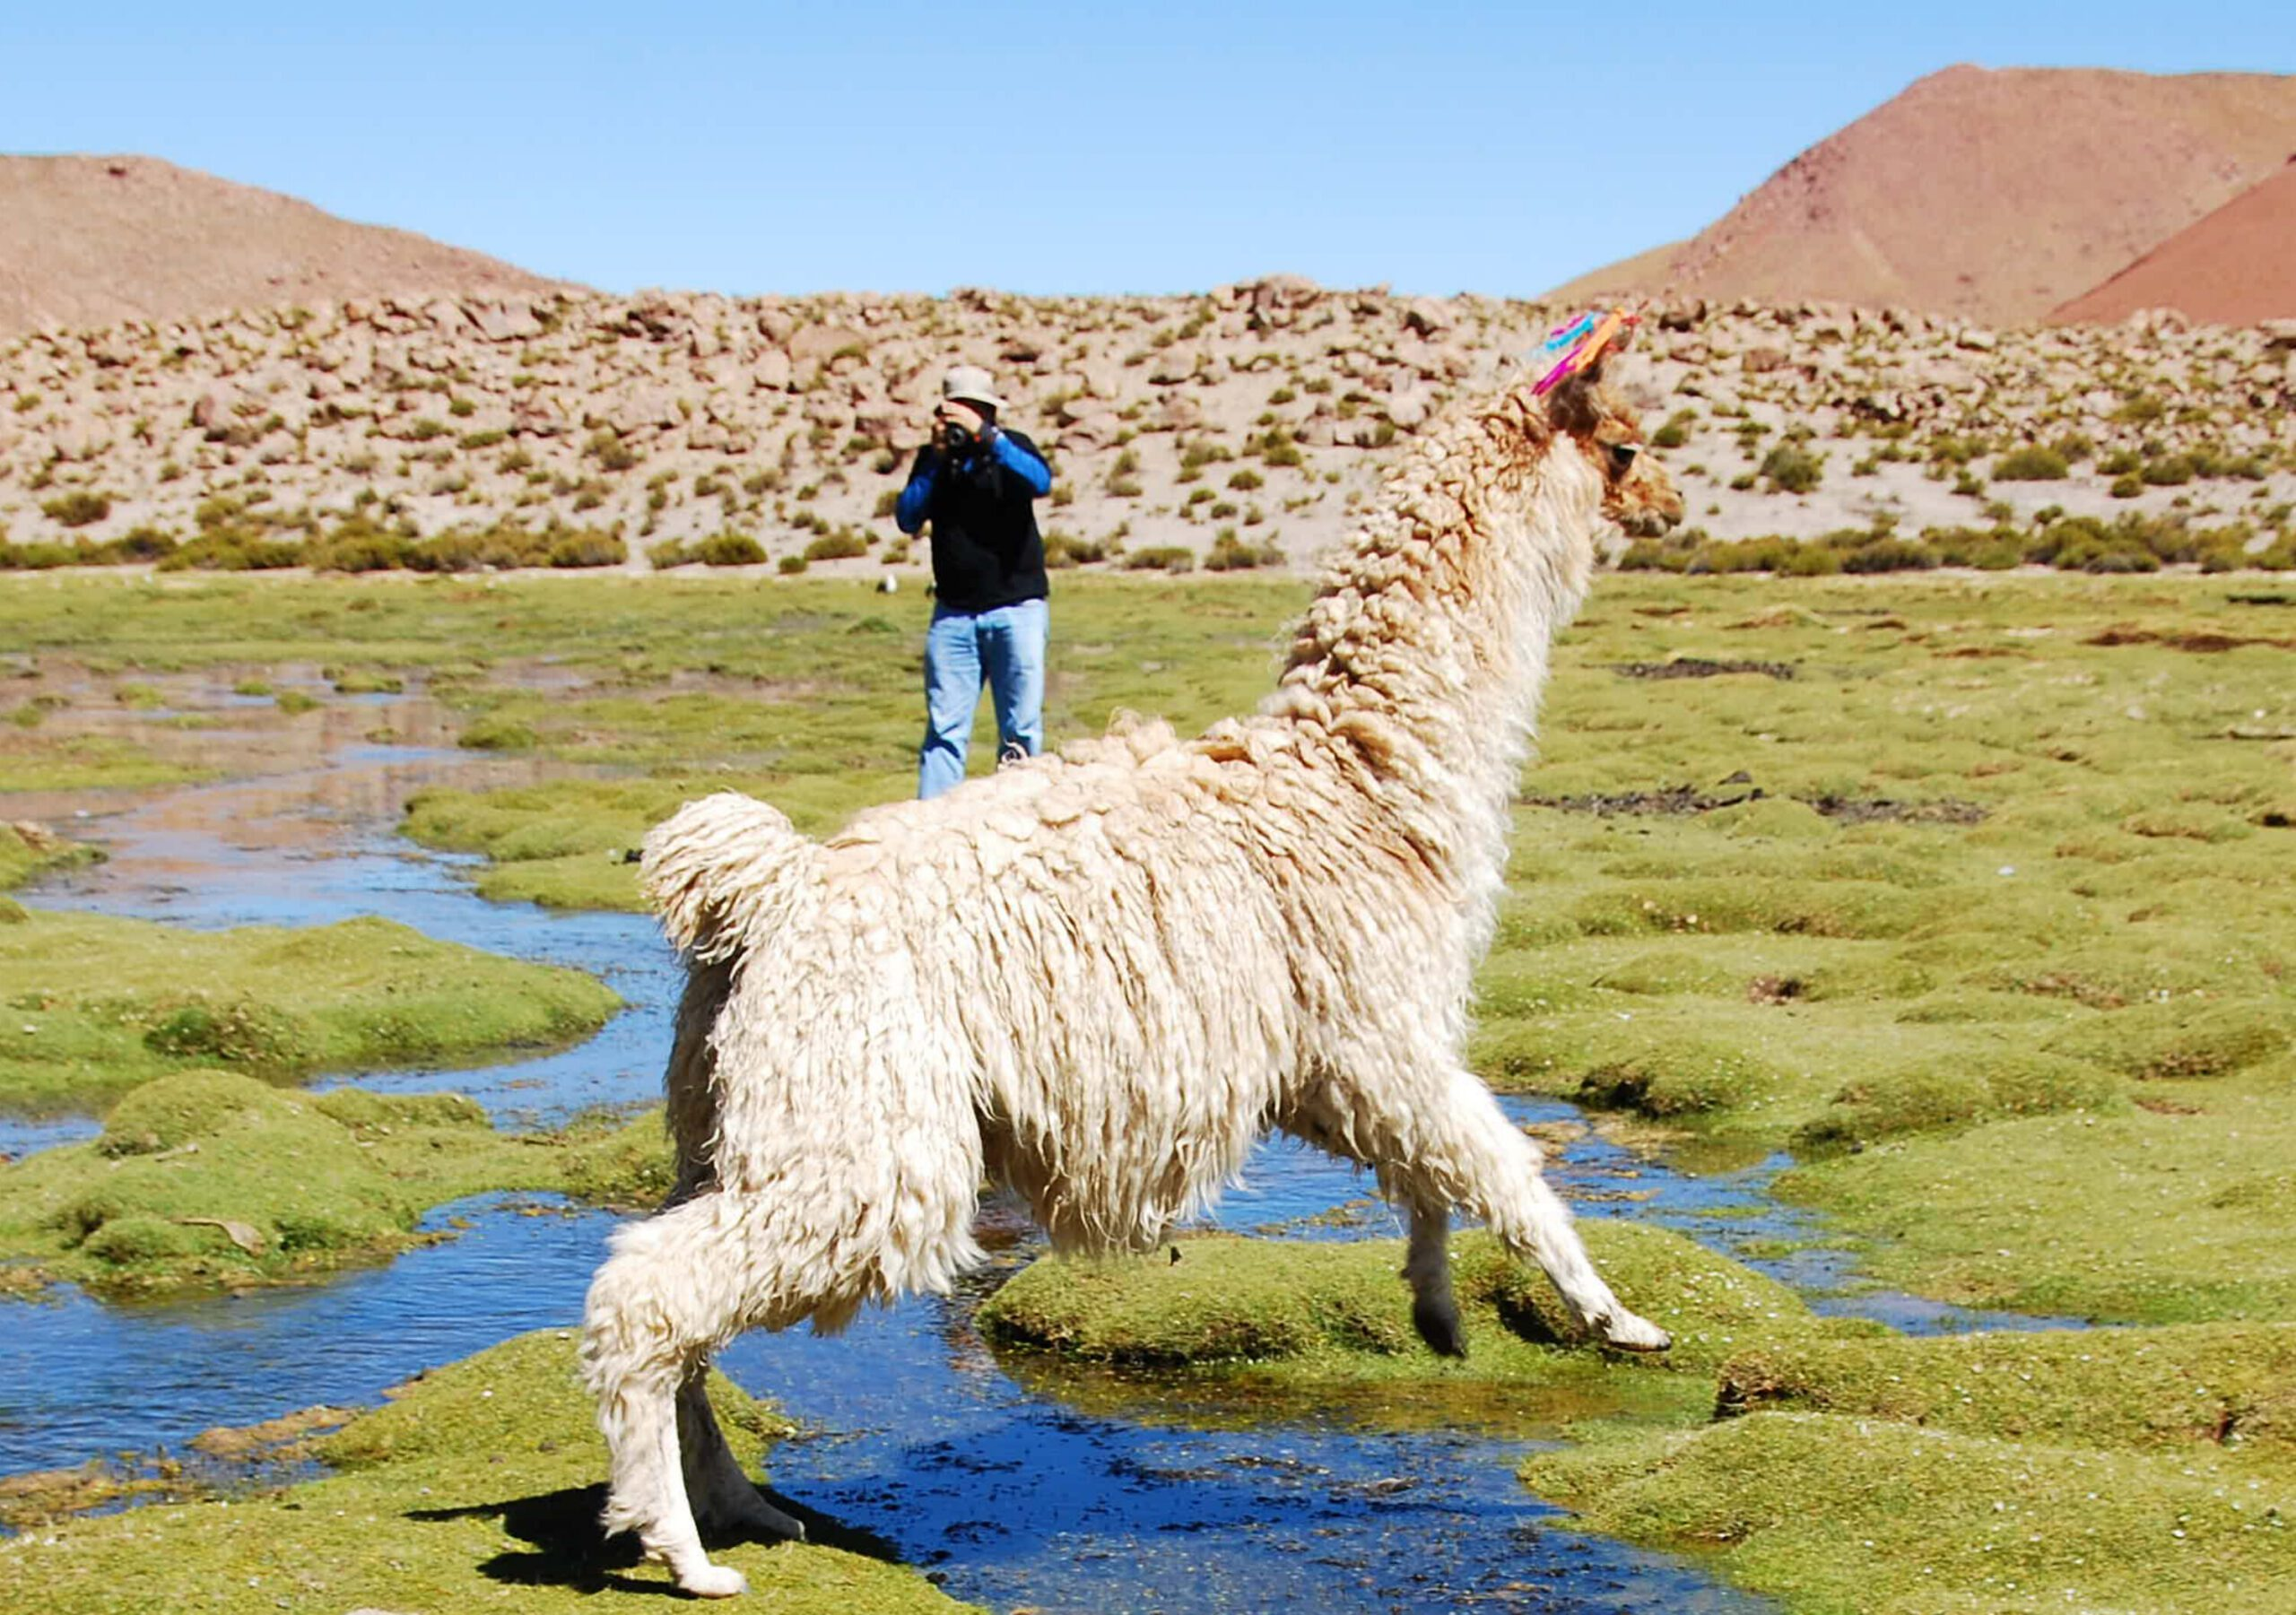 man photographing a llama in Atacama seen on this Peru trip